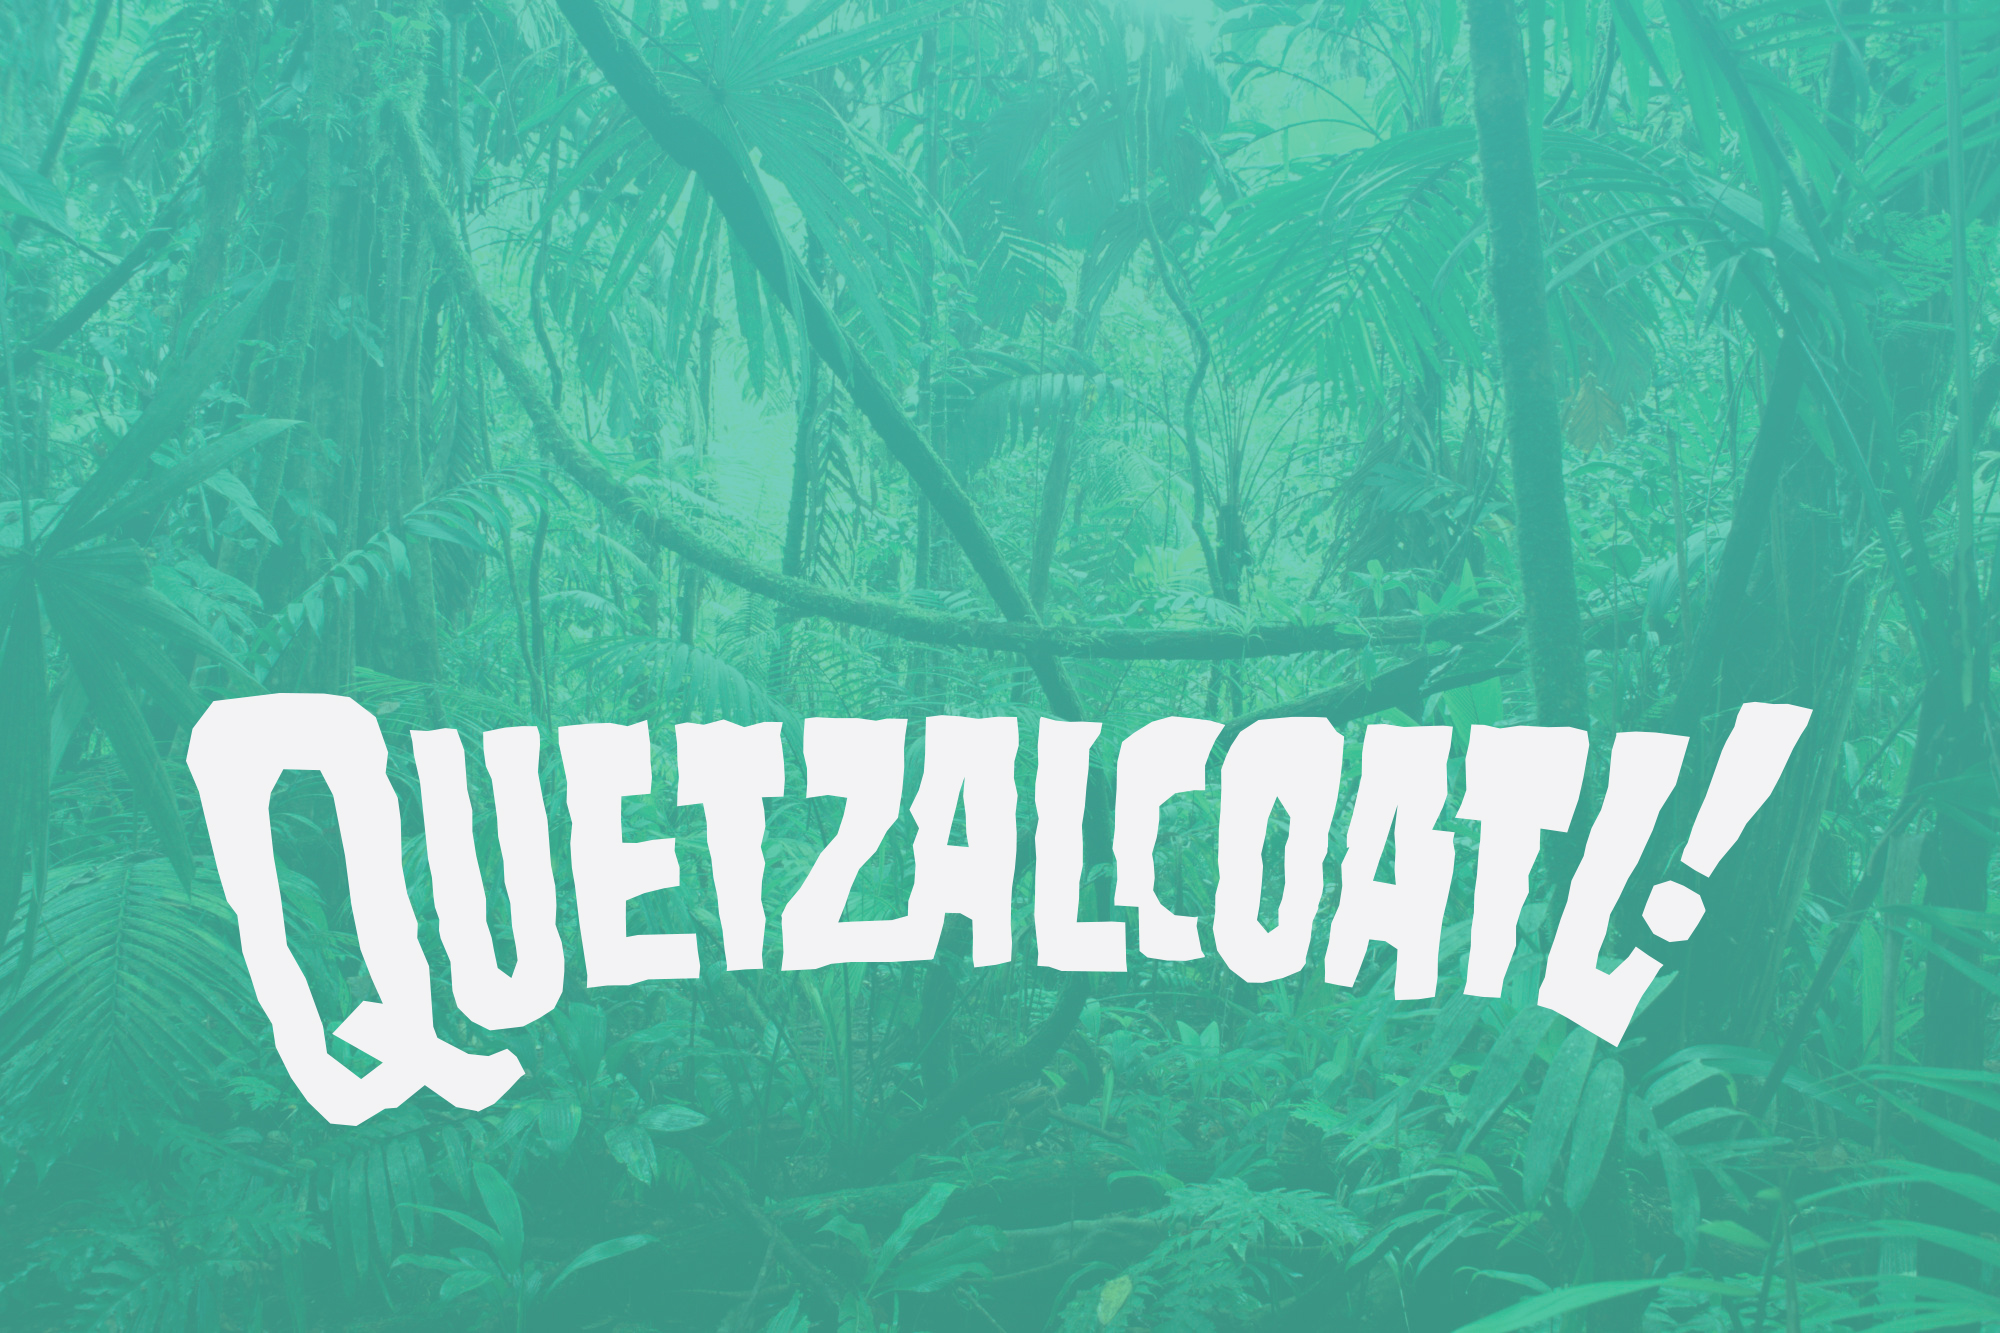 quetzalcoatl-title